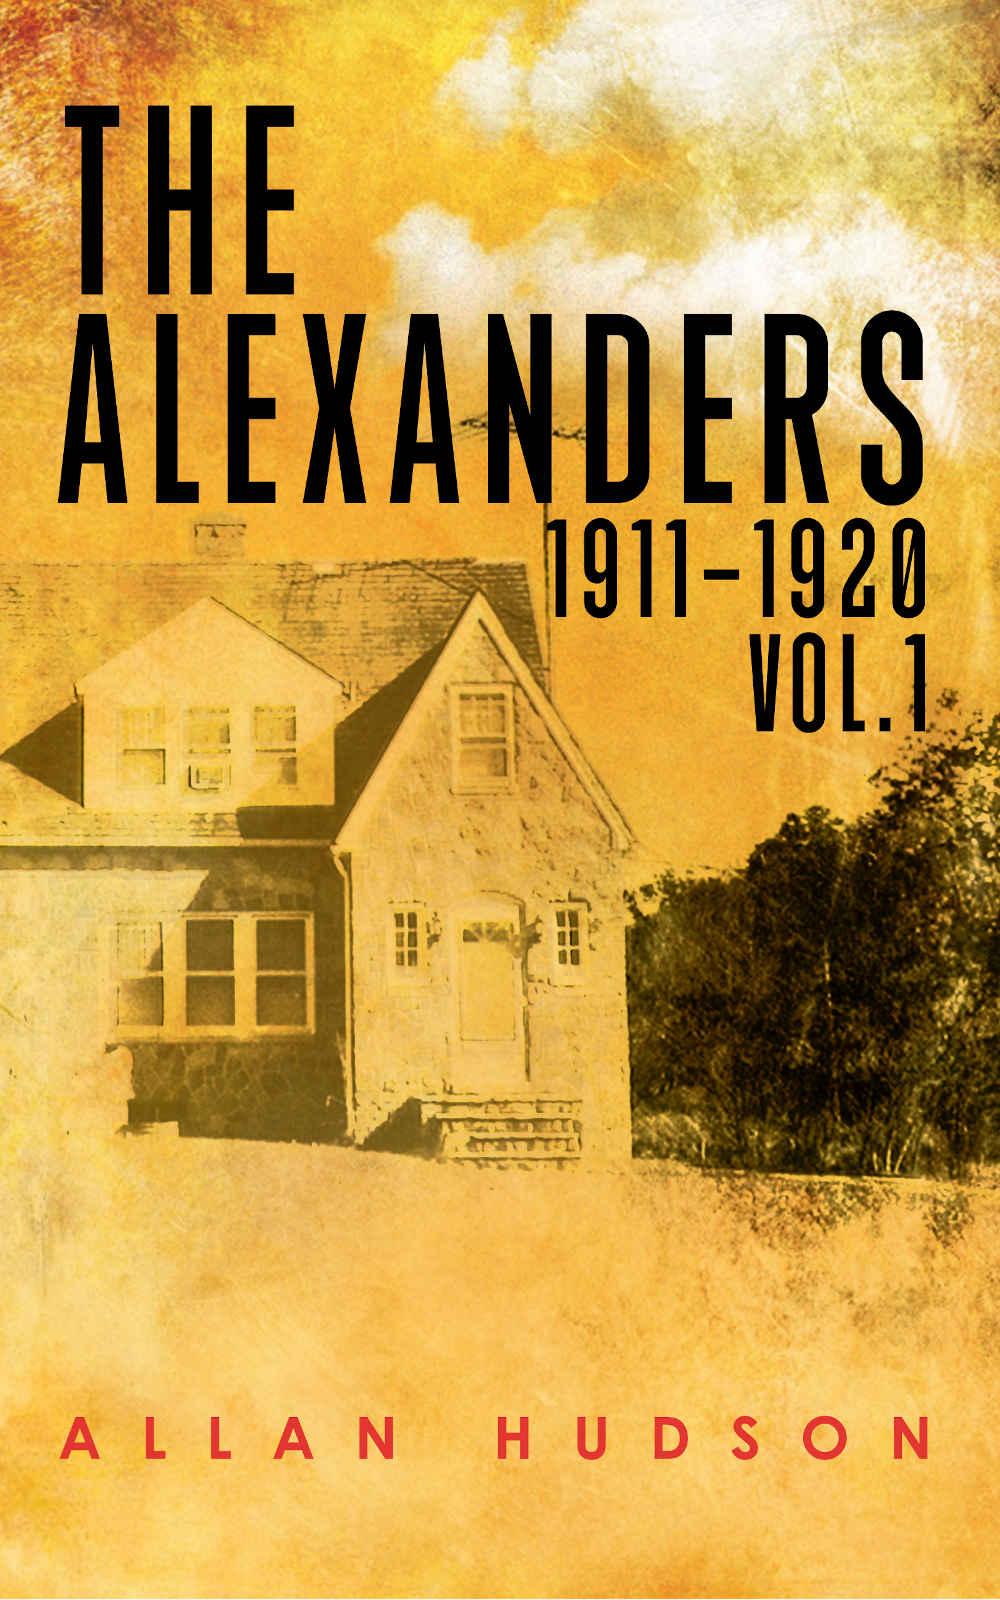 The Alexanders Vol. 1 1911 - 1920